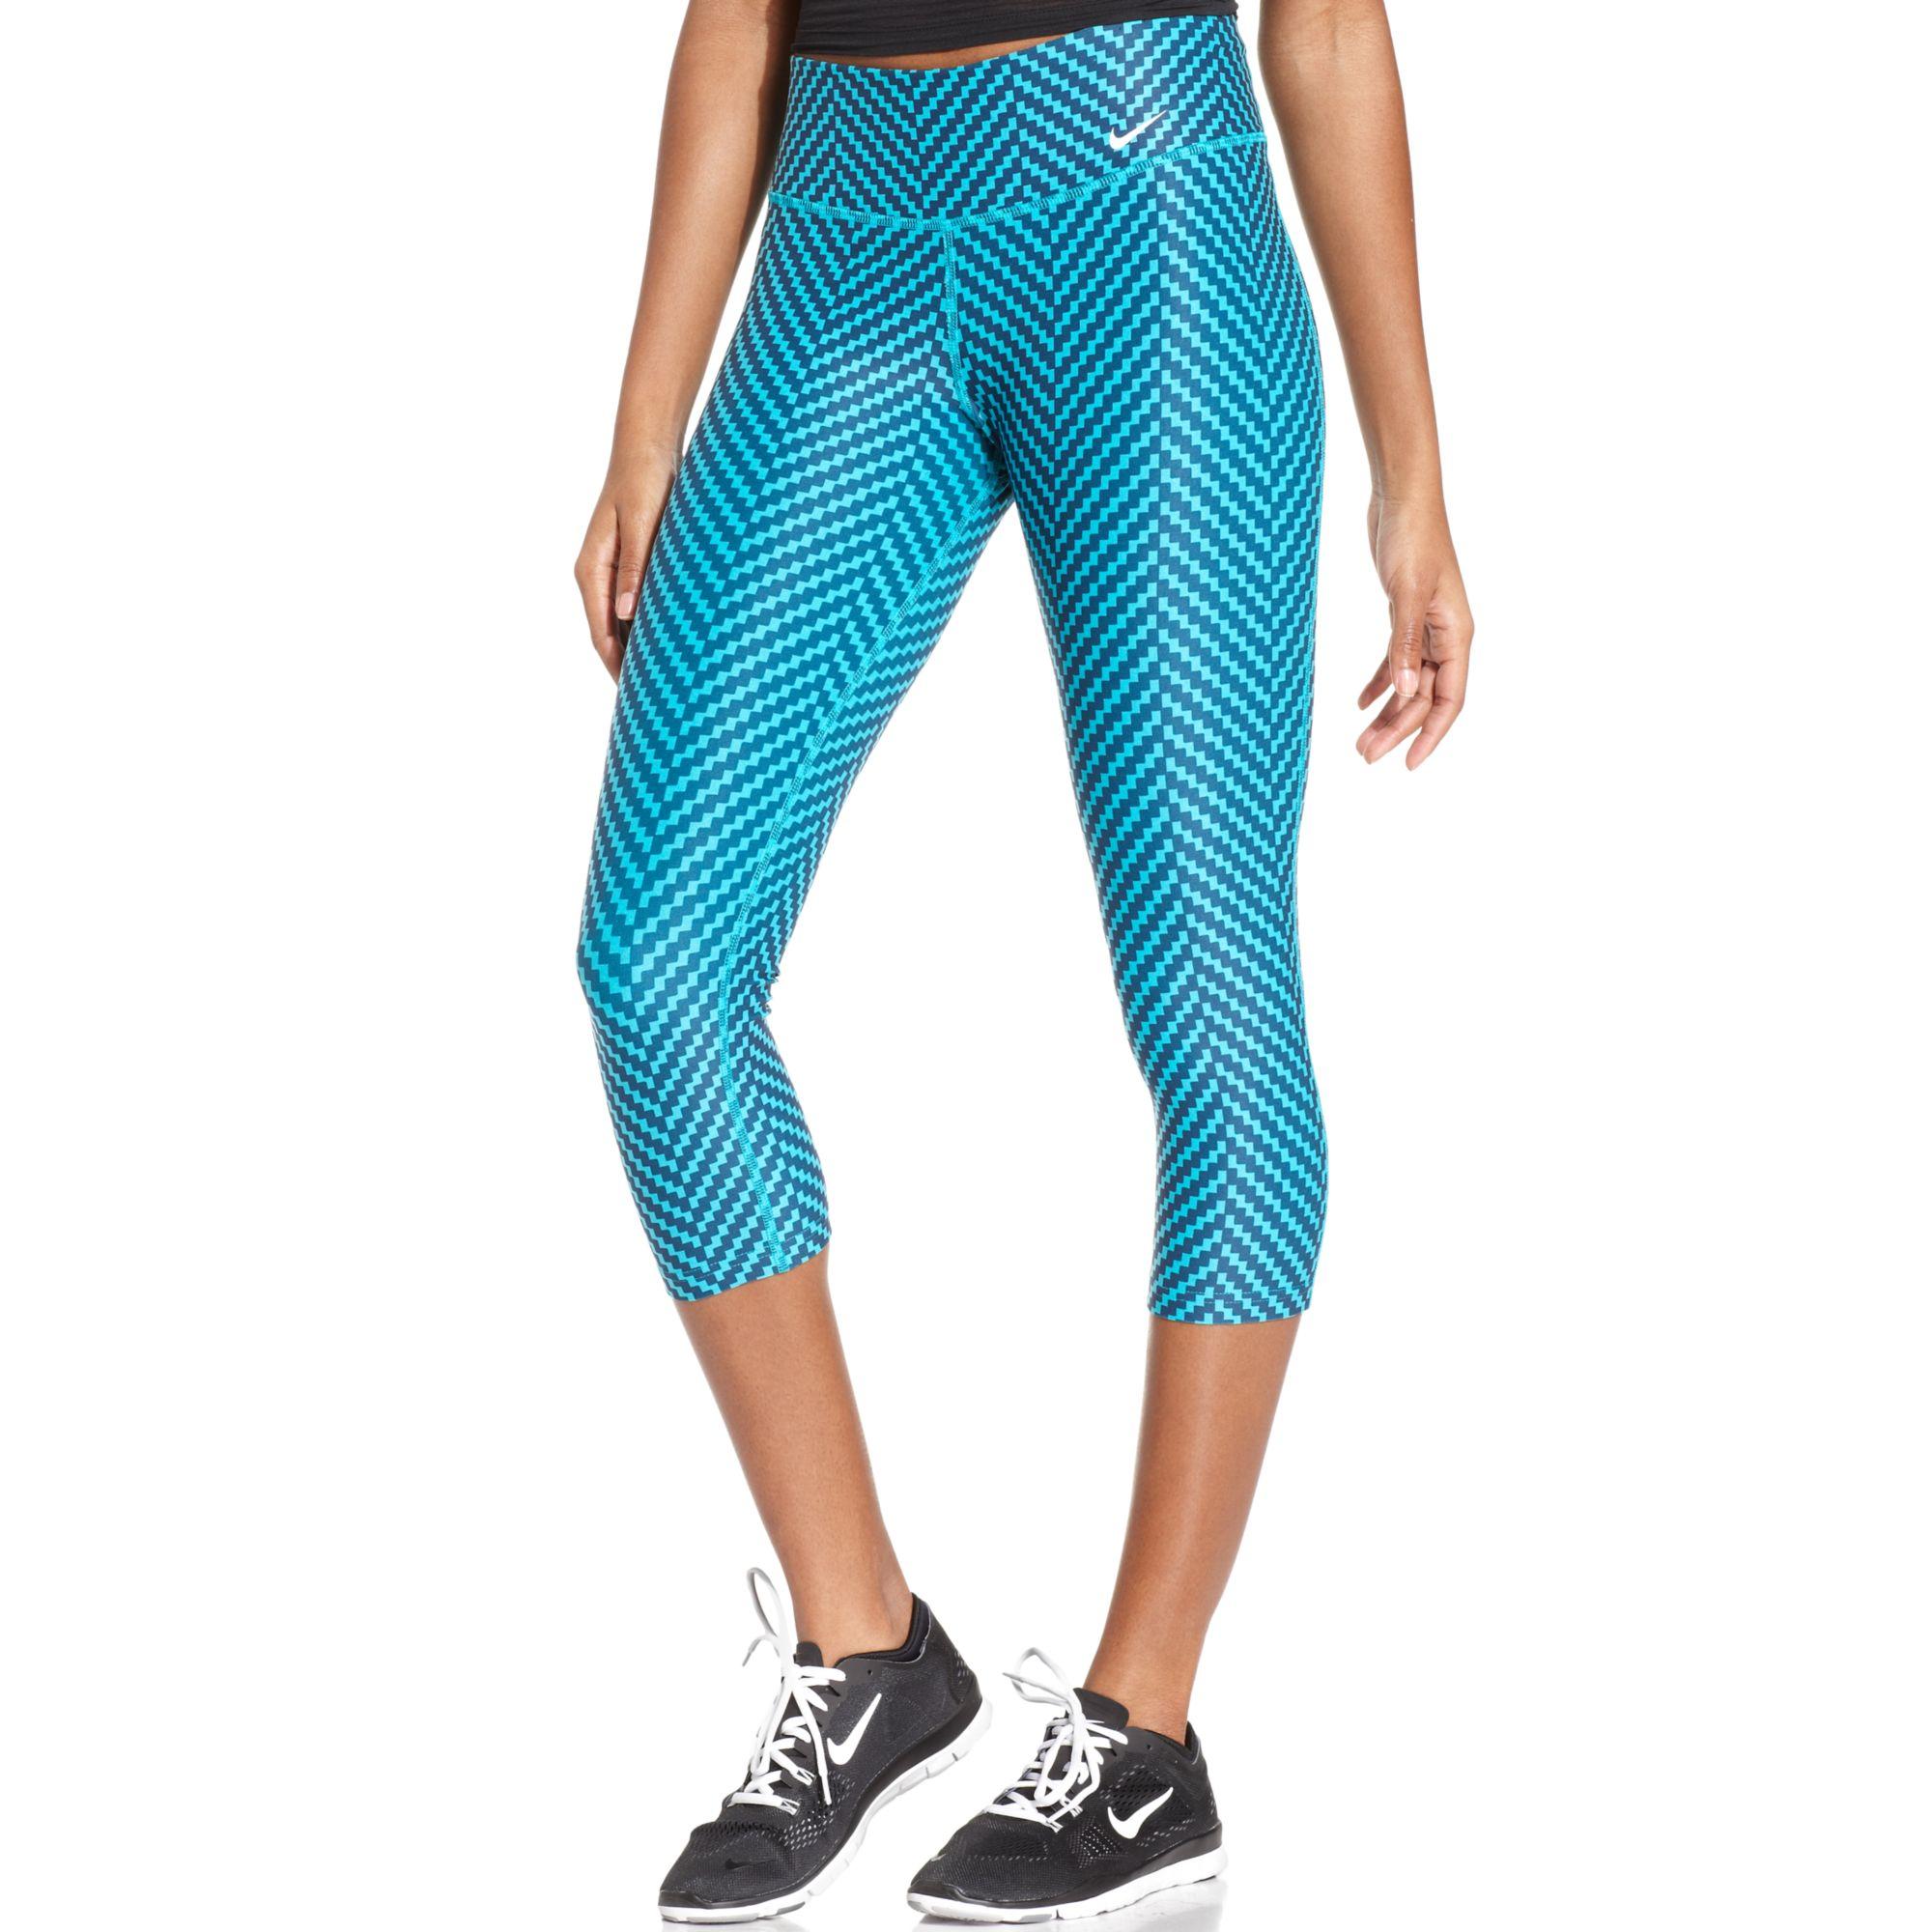 7864126133fb7 Lyst - Nike Legend 20 Printed Drifit Capri Leggings in Blue